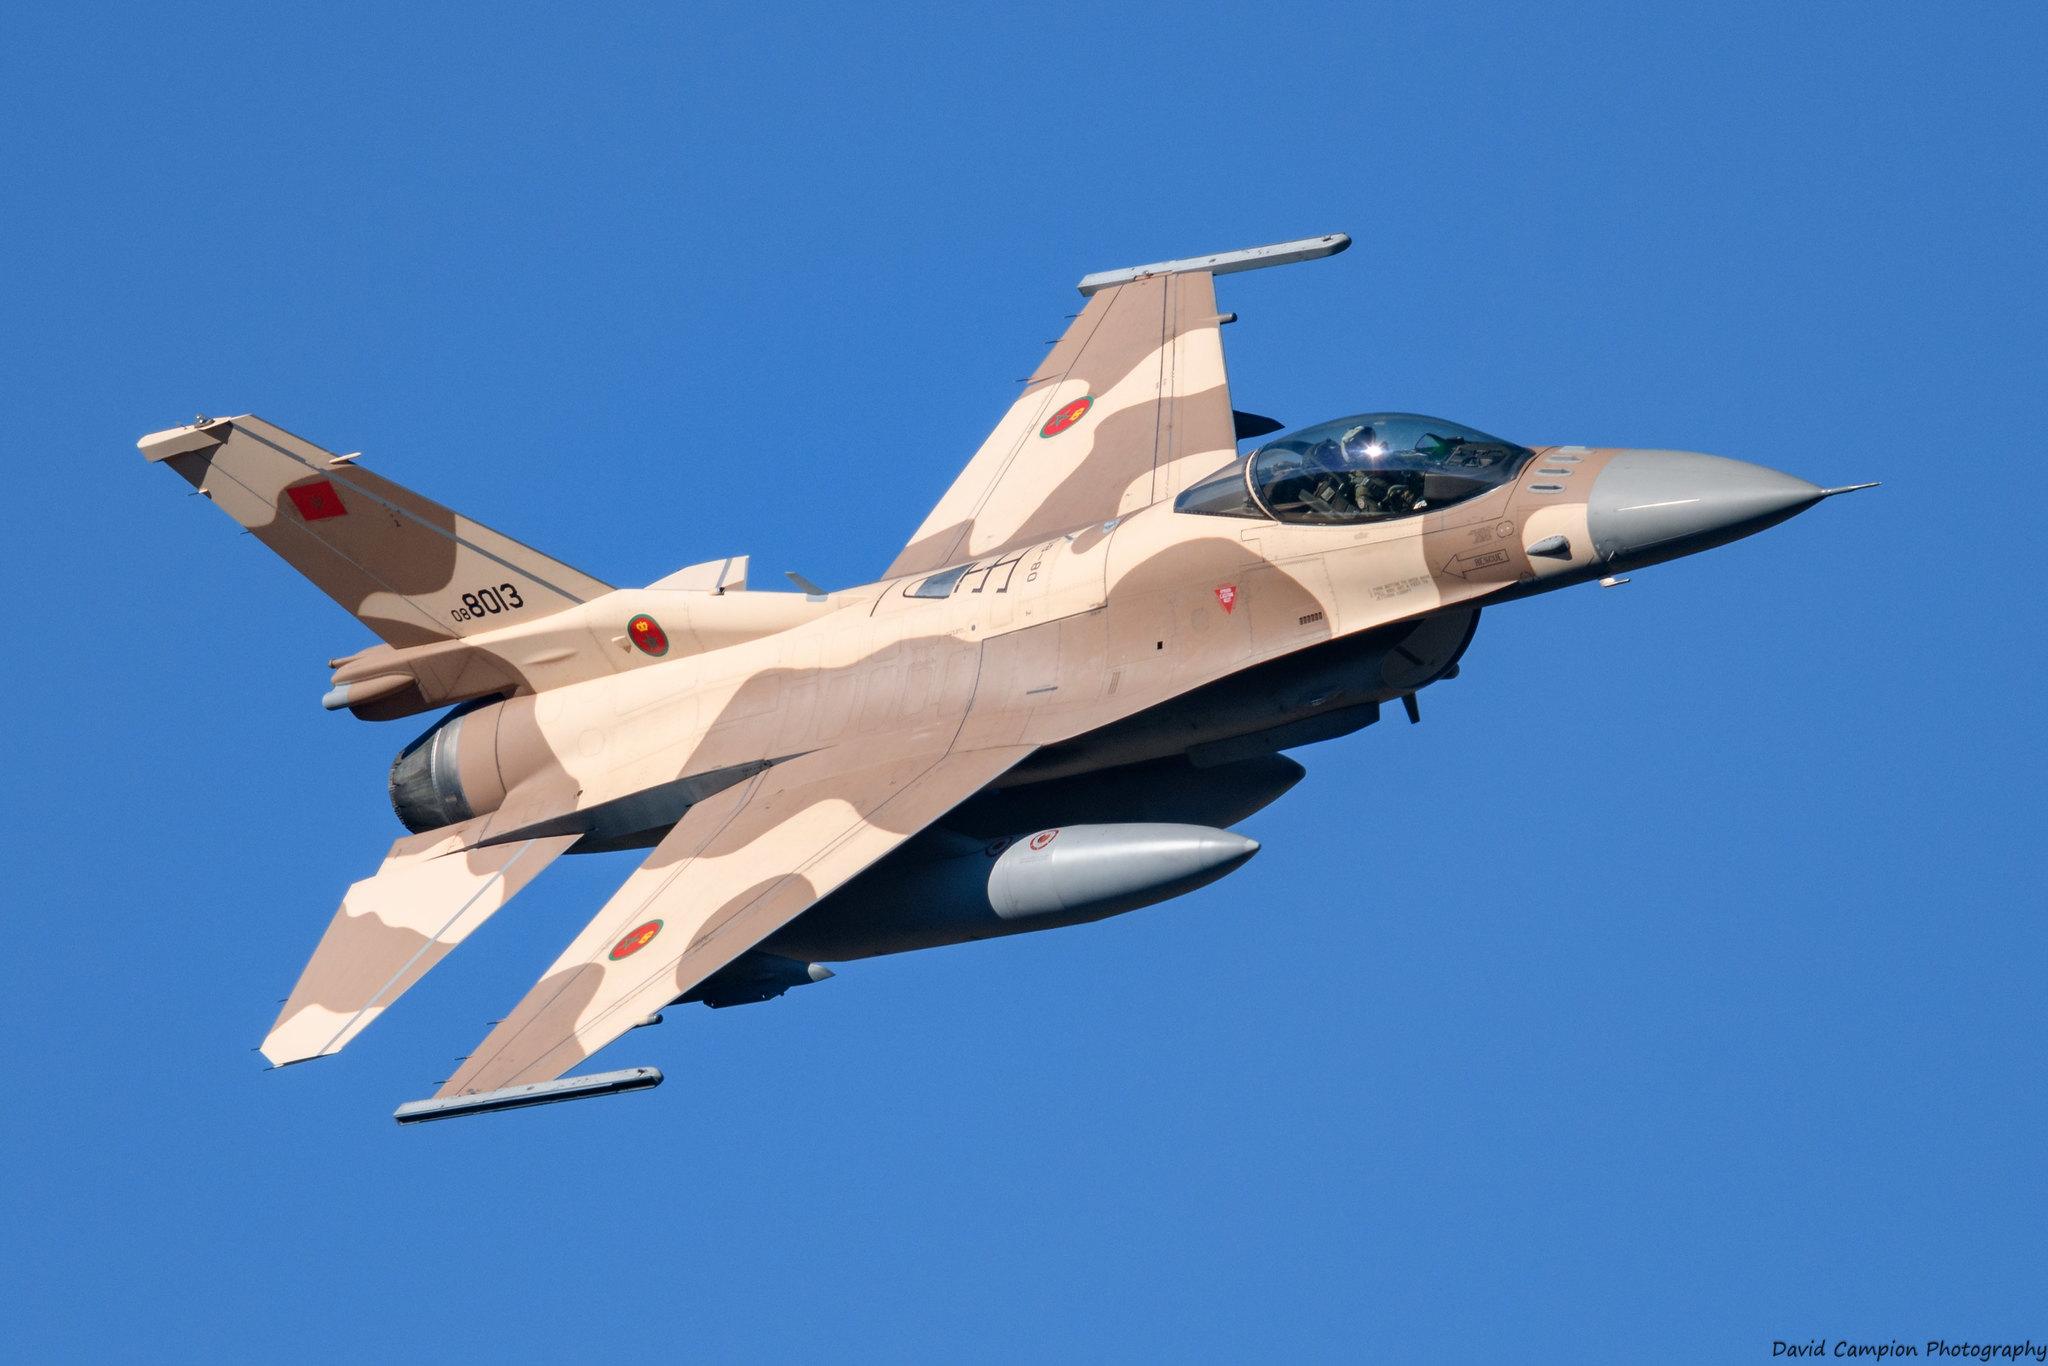 Photos RMAF F-16 C/D Block 52+ - Page 12 45893552775_f6f7e114bd_k